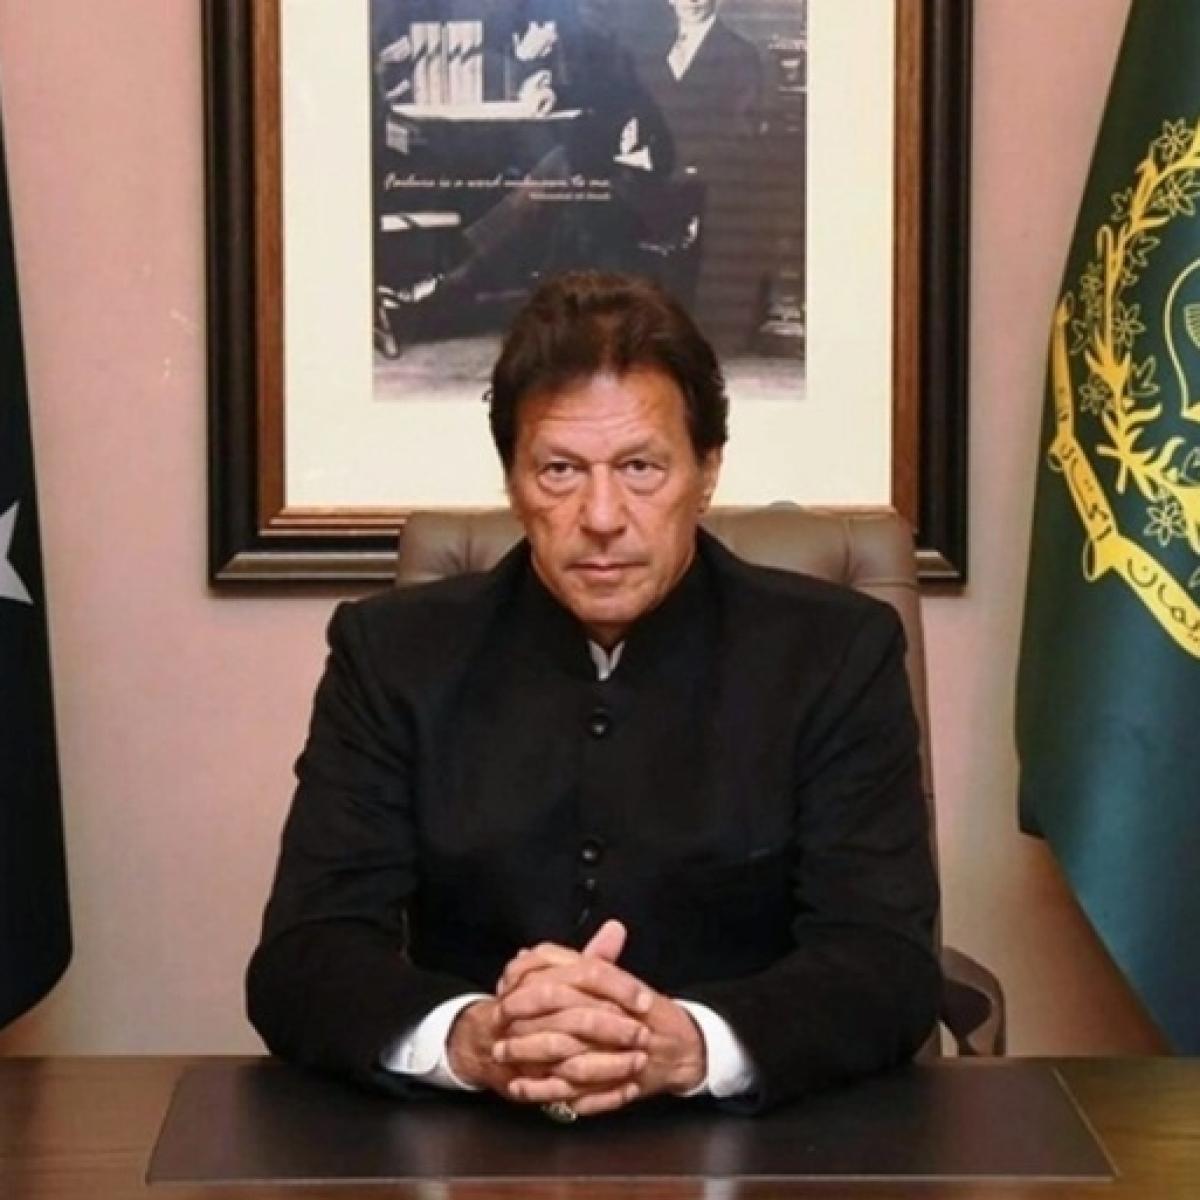 'Shocked and saddened': Pakistan PM Imran Khan reacts after PIA flight PK 8303 crashes near Karachi Airport